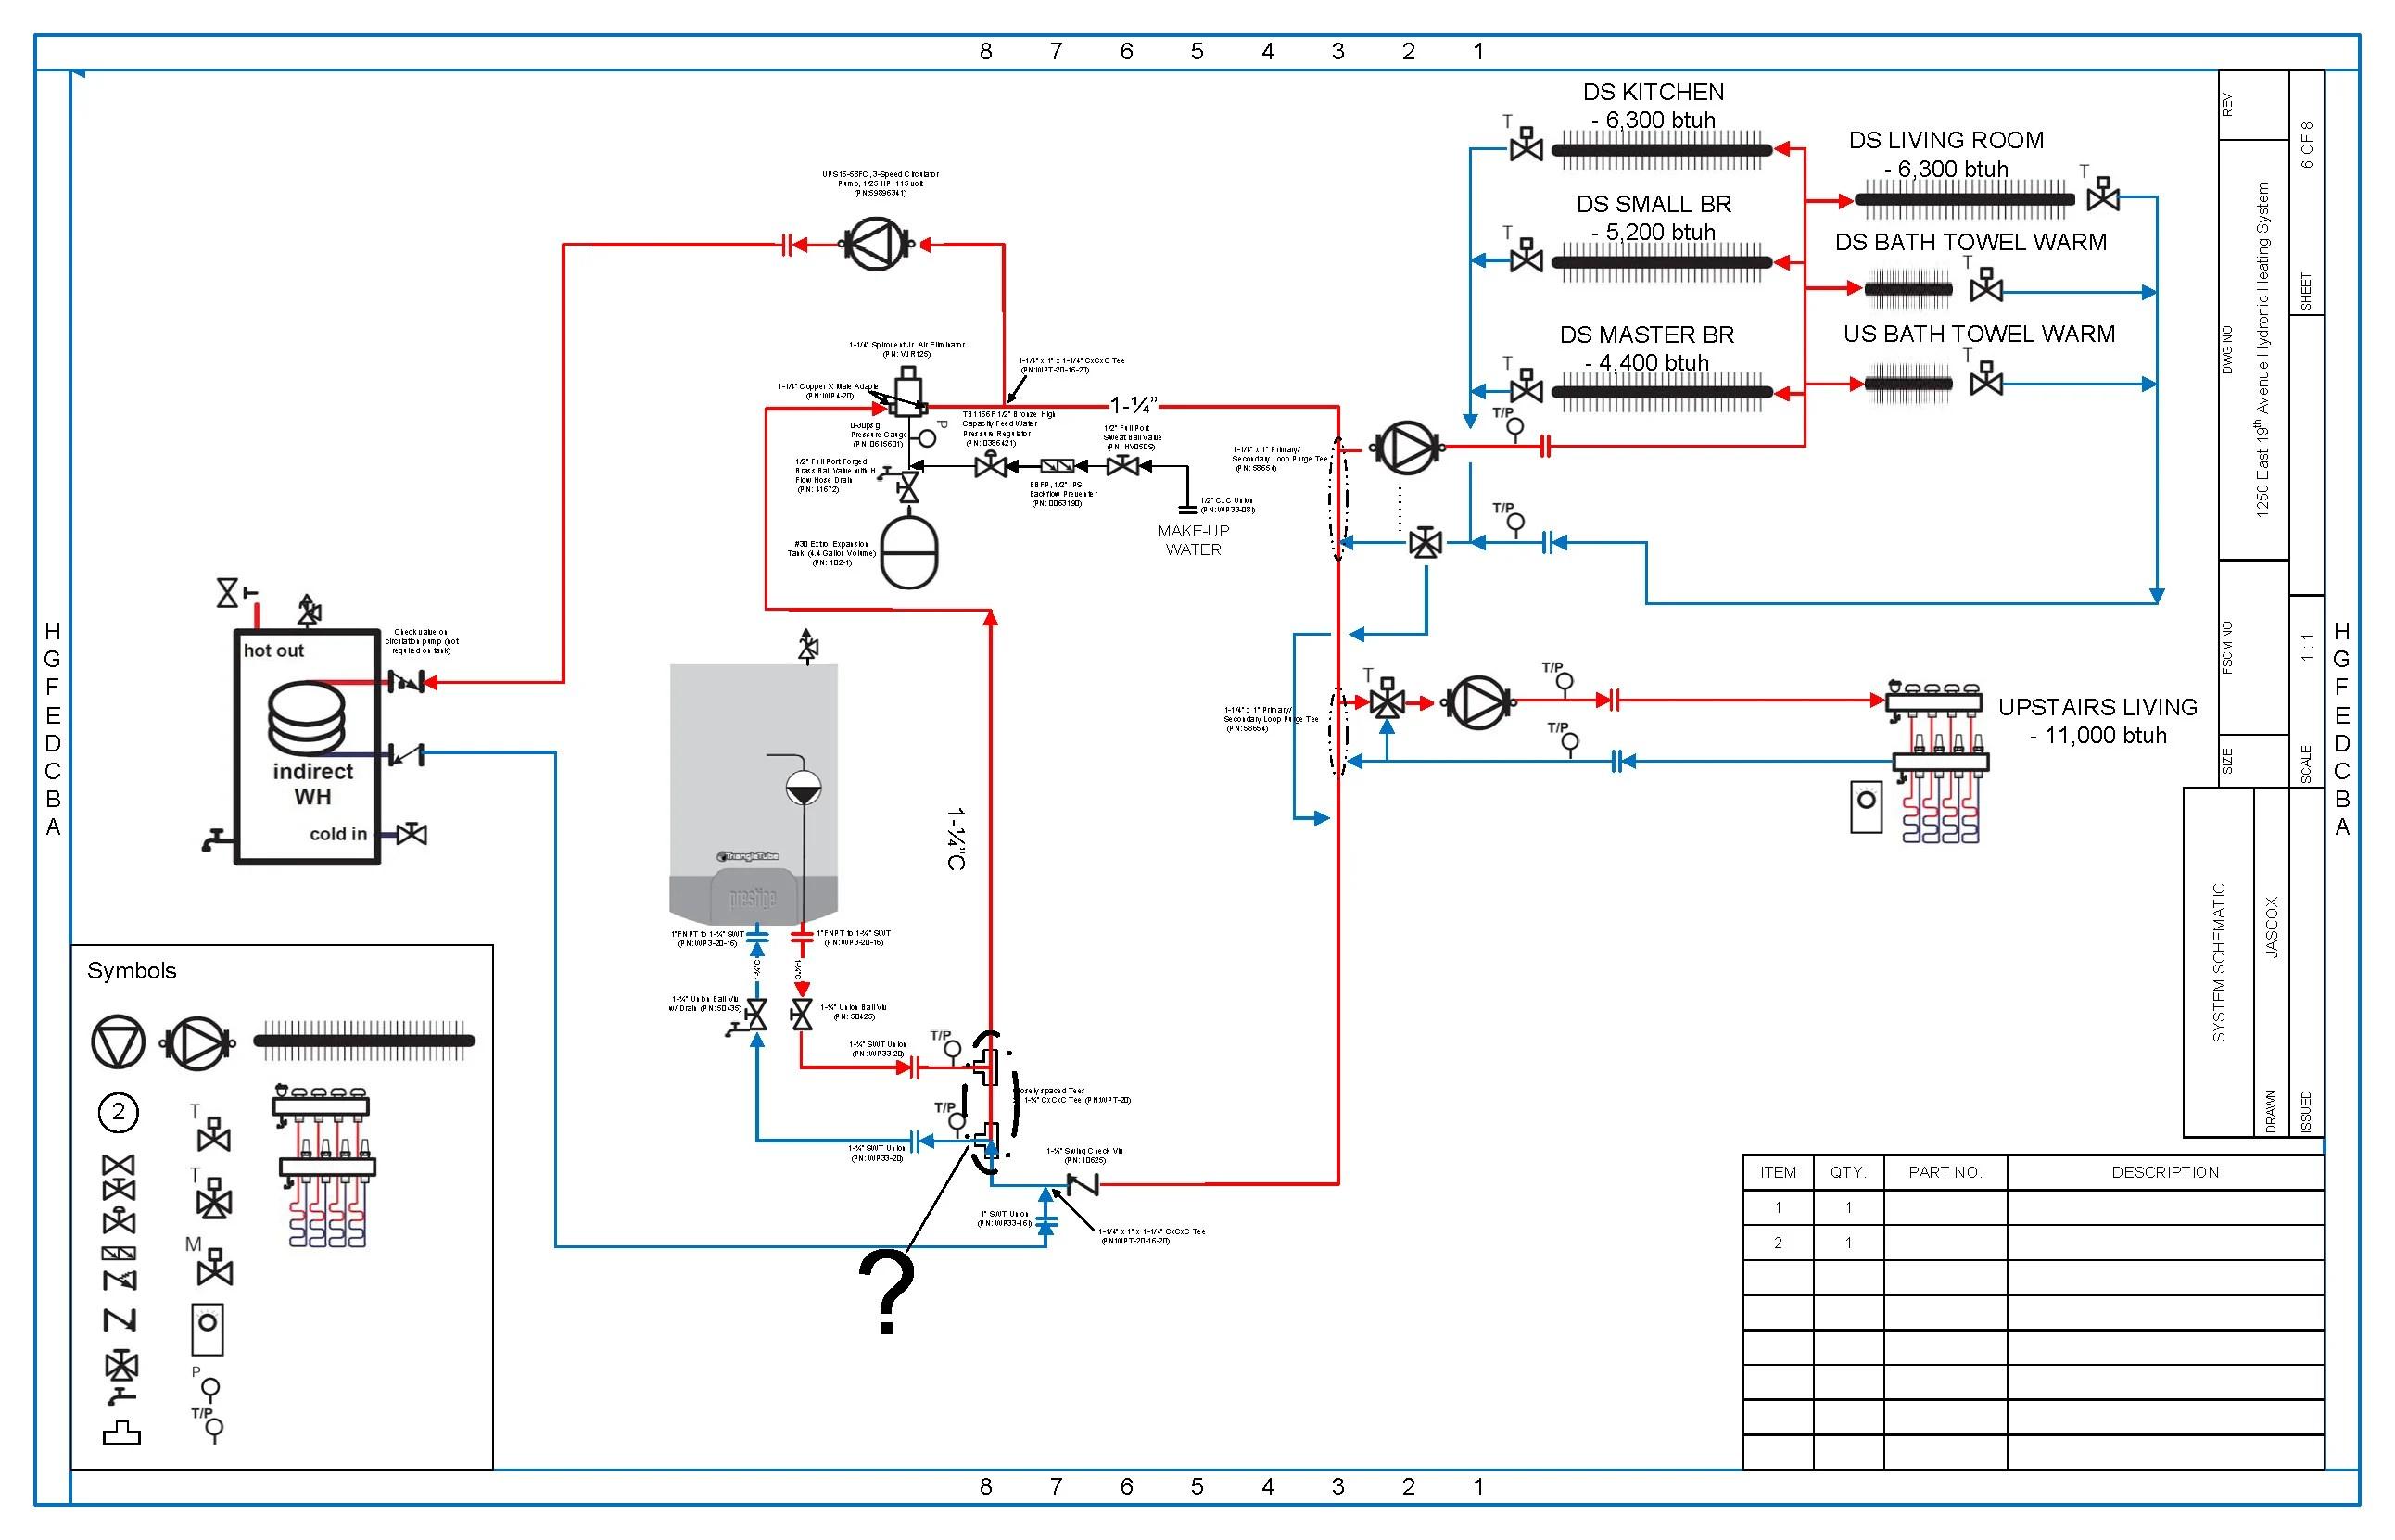 20101031Hydronic Heating Schematic?resize\\=665%2C428\\&ssl\\=1 100 [ honeywell pipe thermostat wiring diagram ] honeywell Honeywell Thermostat Wiring Diagram at n-0.co